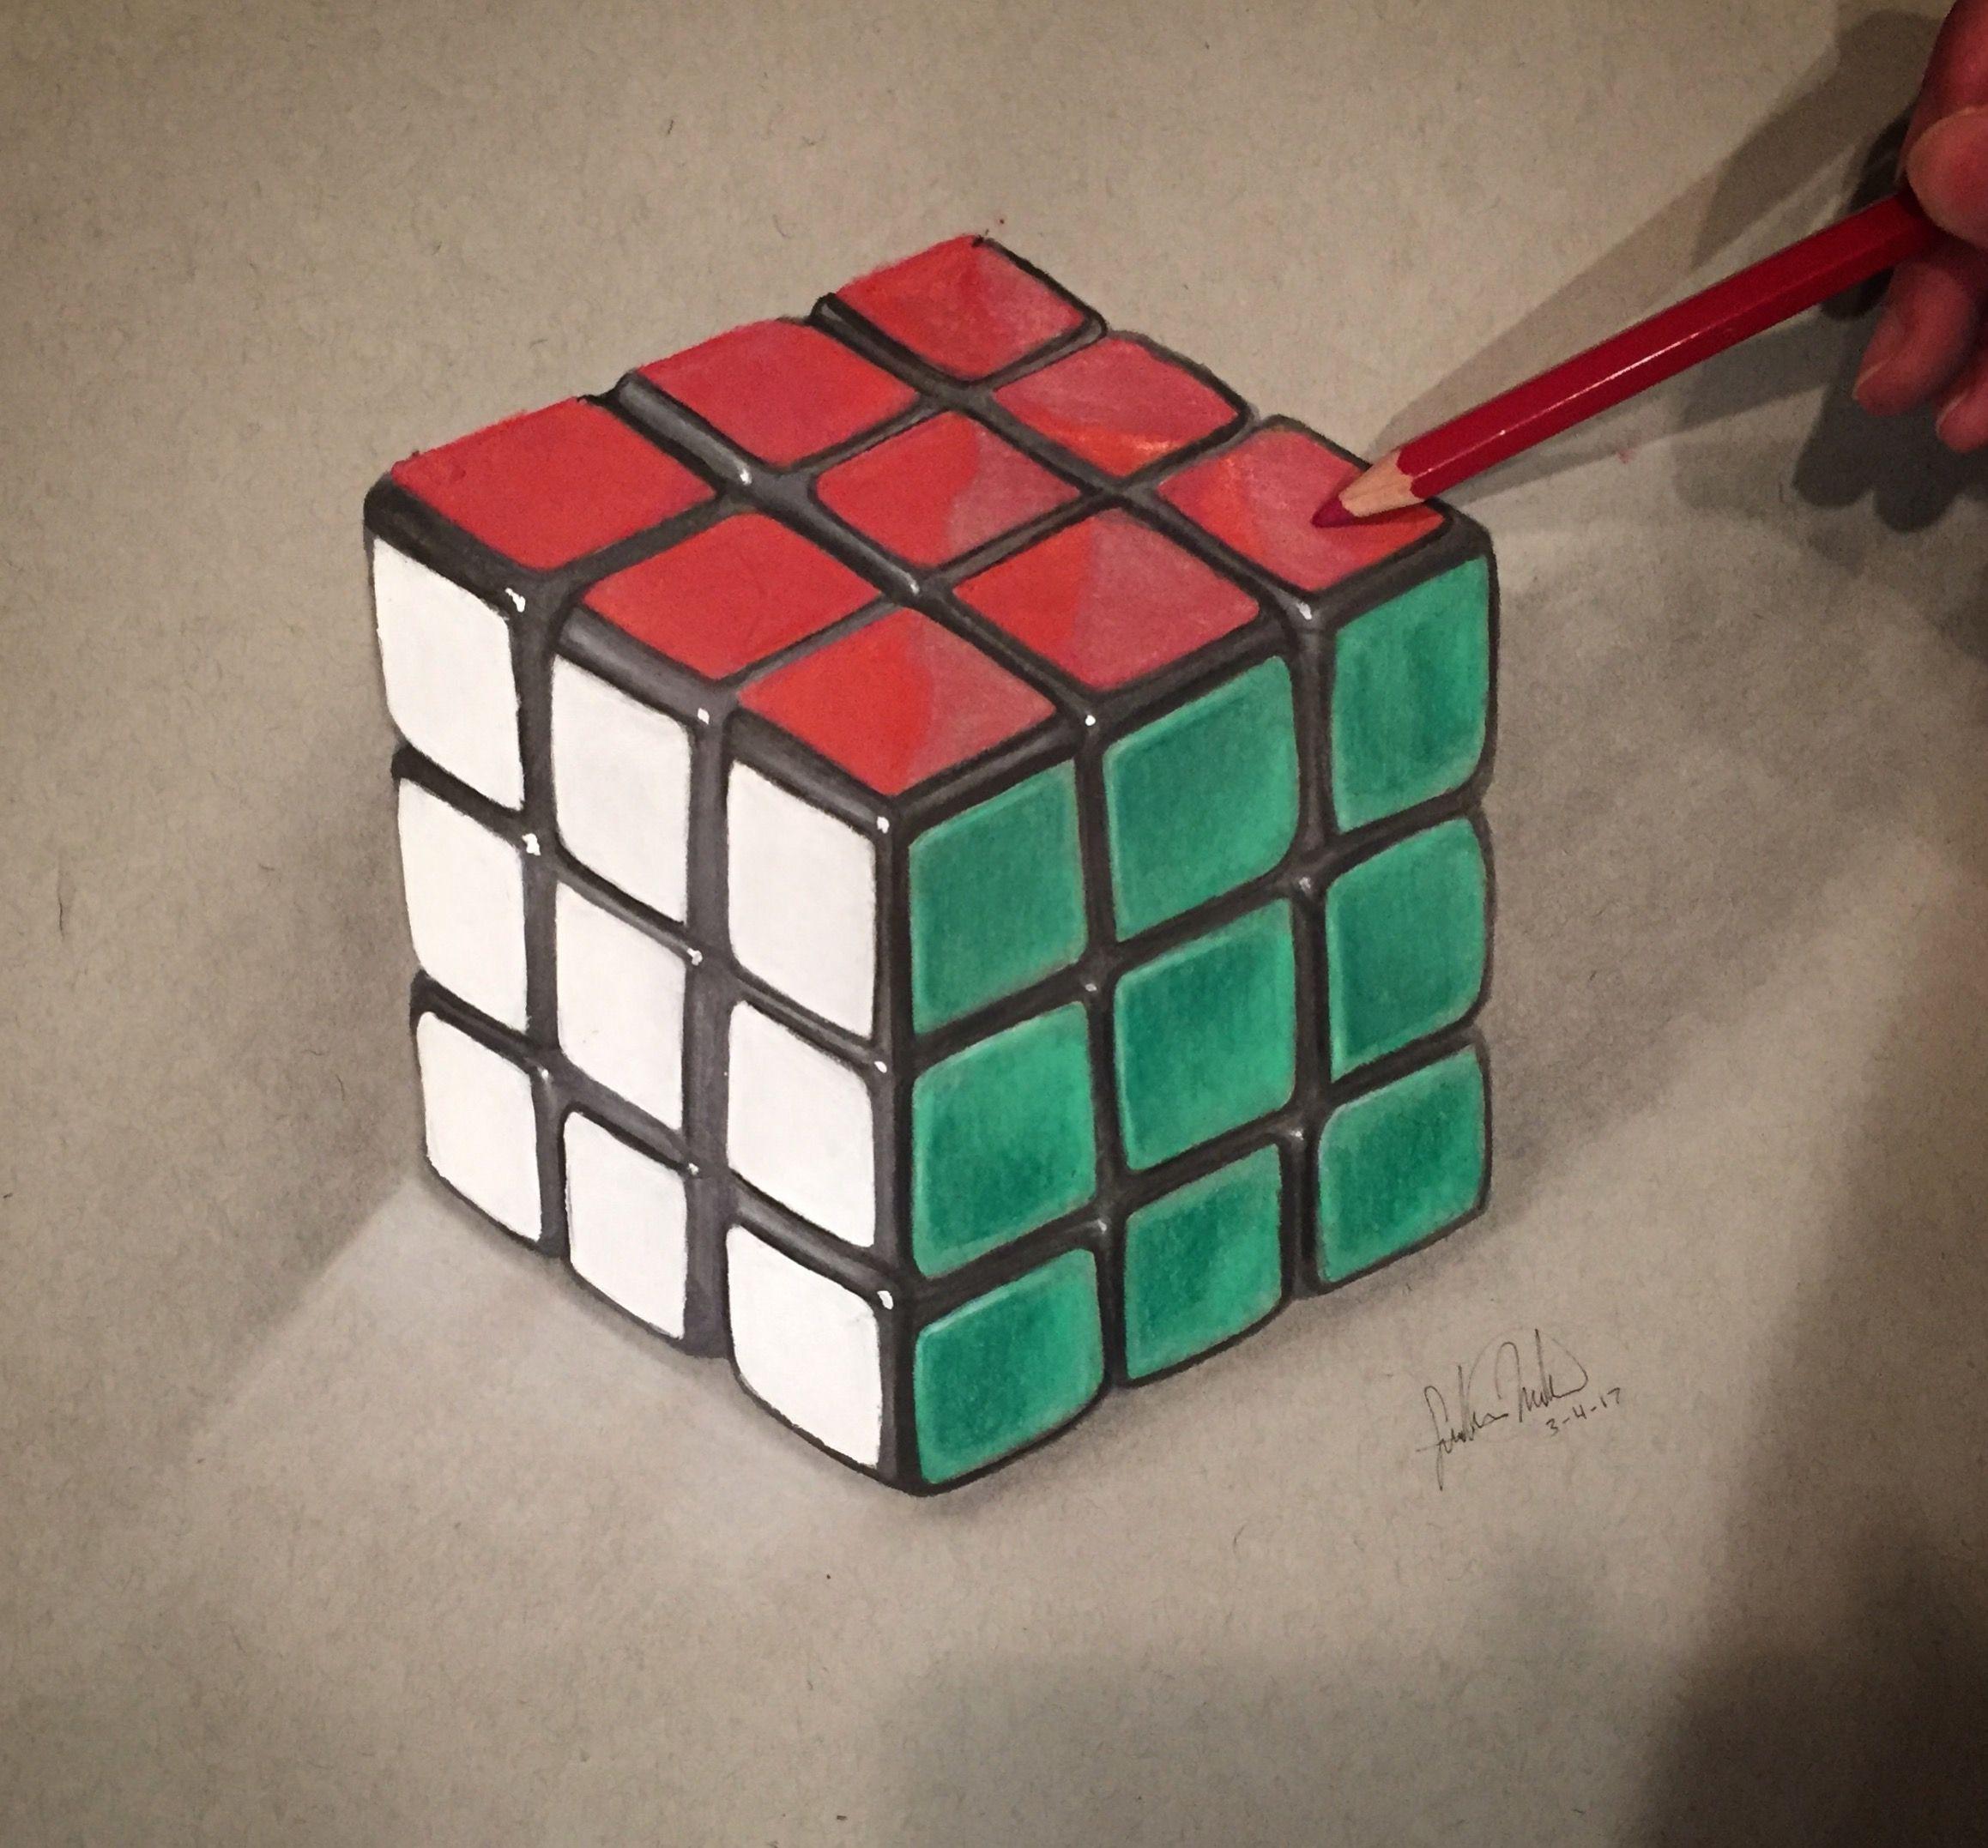 svg Realistic Rubix Cube Drawing